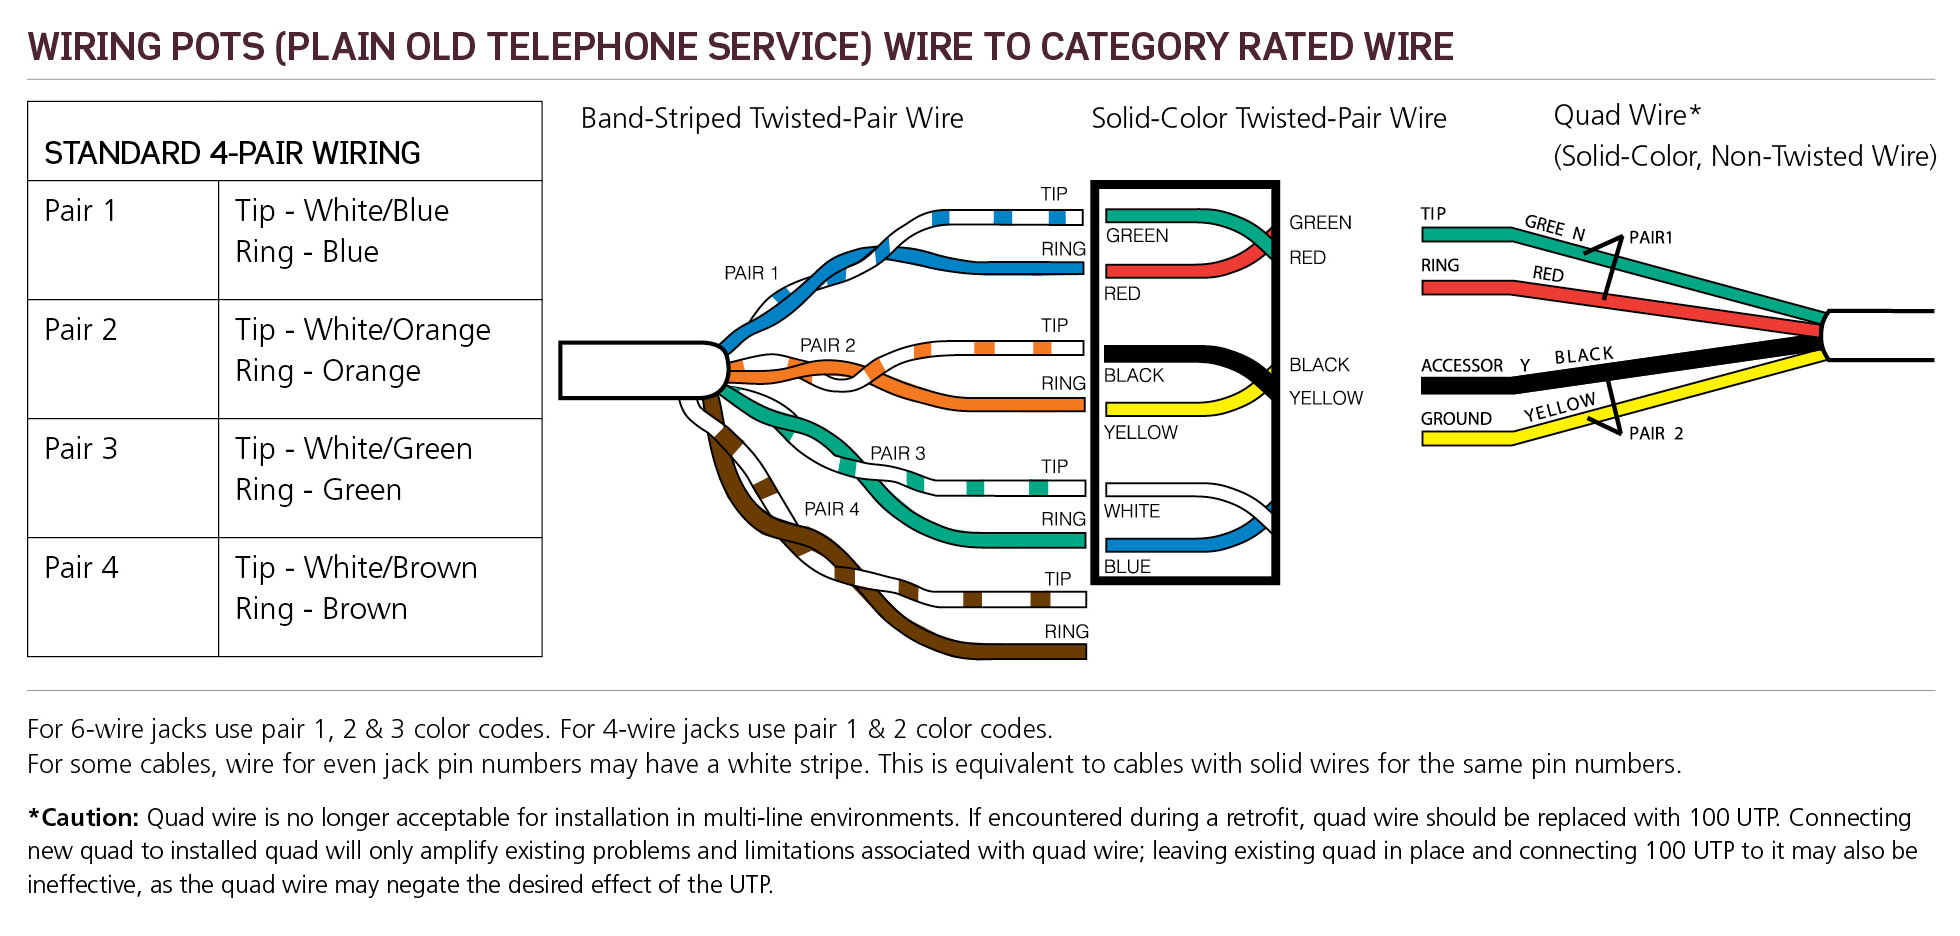 dsl hookup diagram wiring diagramstelephone dsl splitter wiring diagram download wiring diagram how does the internet work diagram dsl hookup diagram